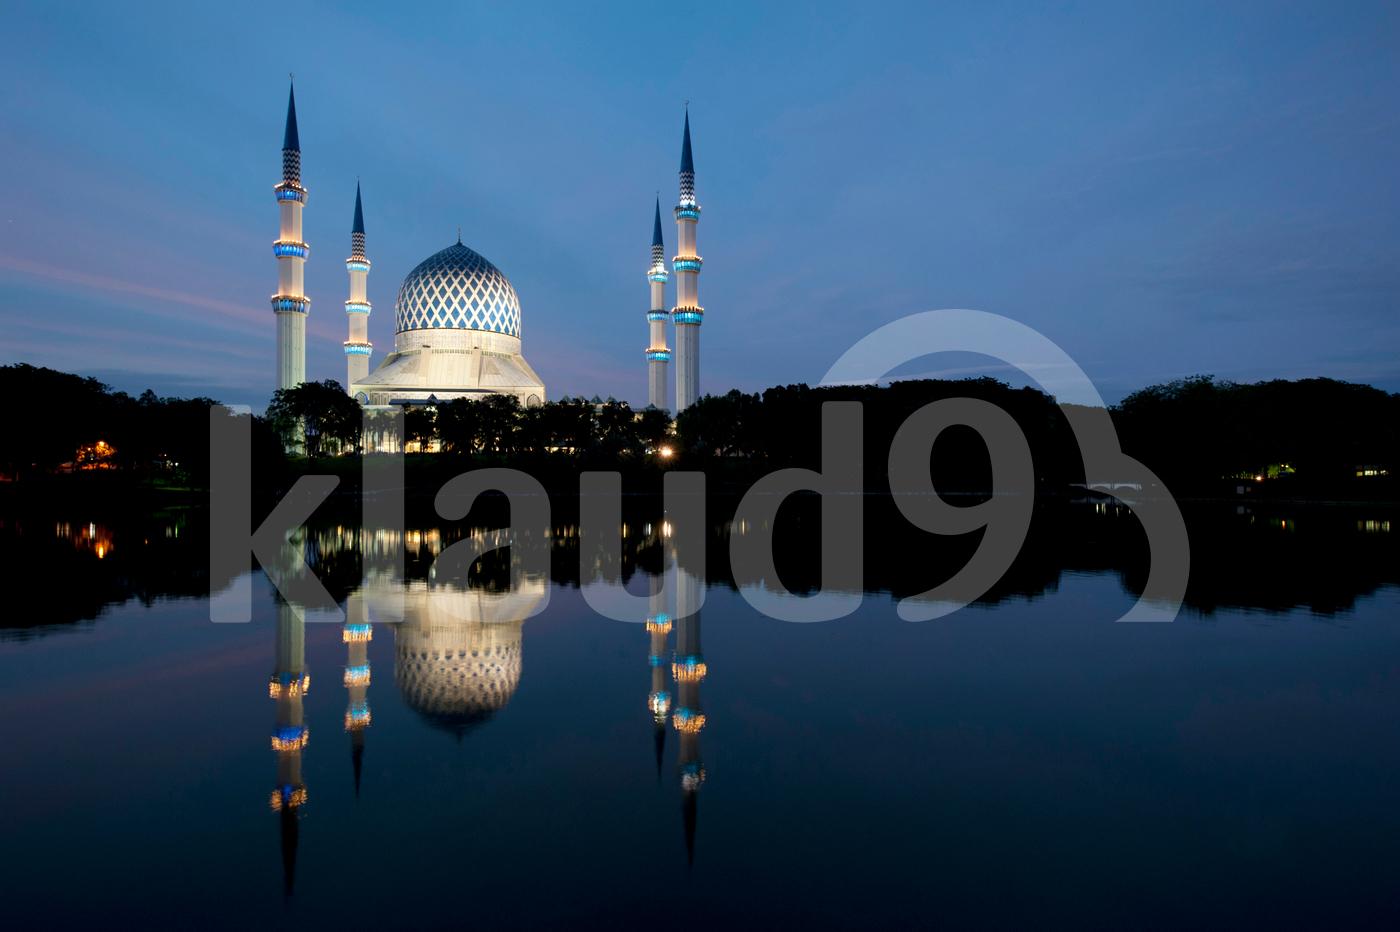 Sultan Salahuddin Abdul Aziz Mosque